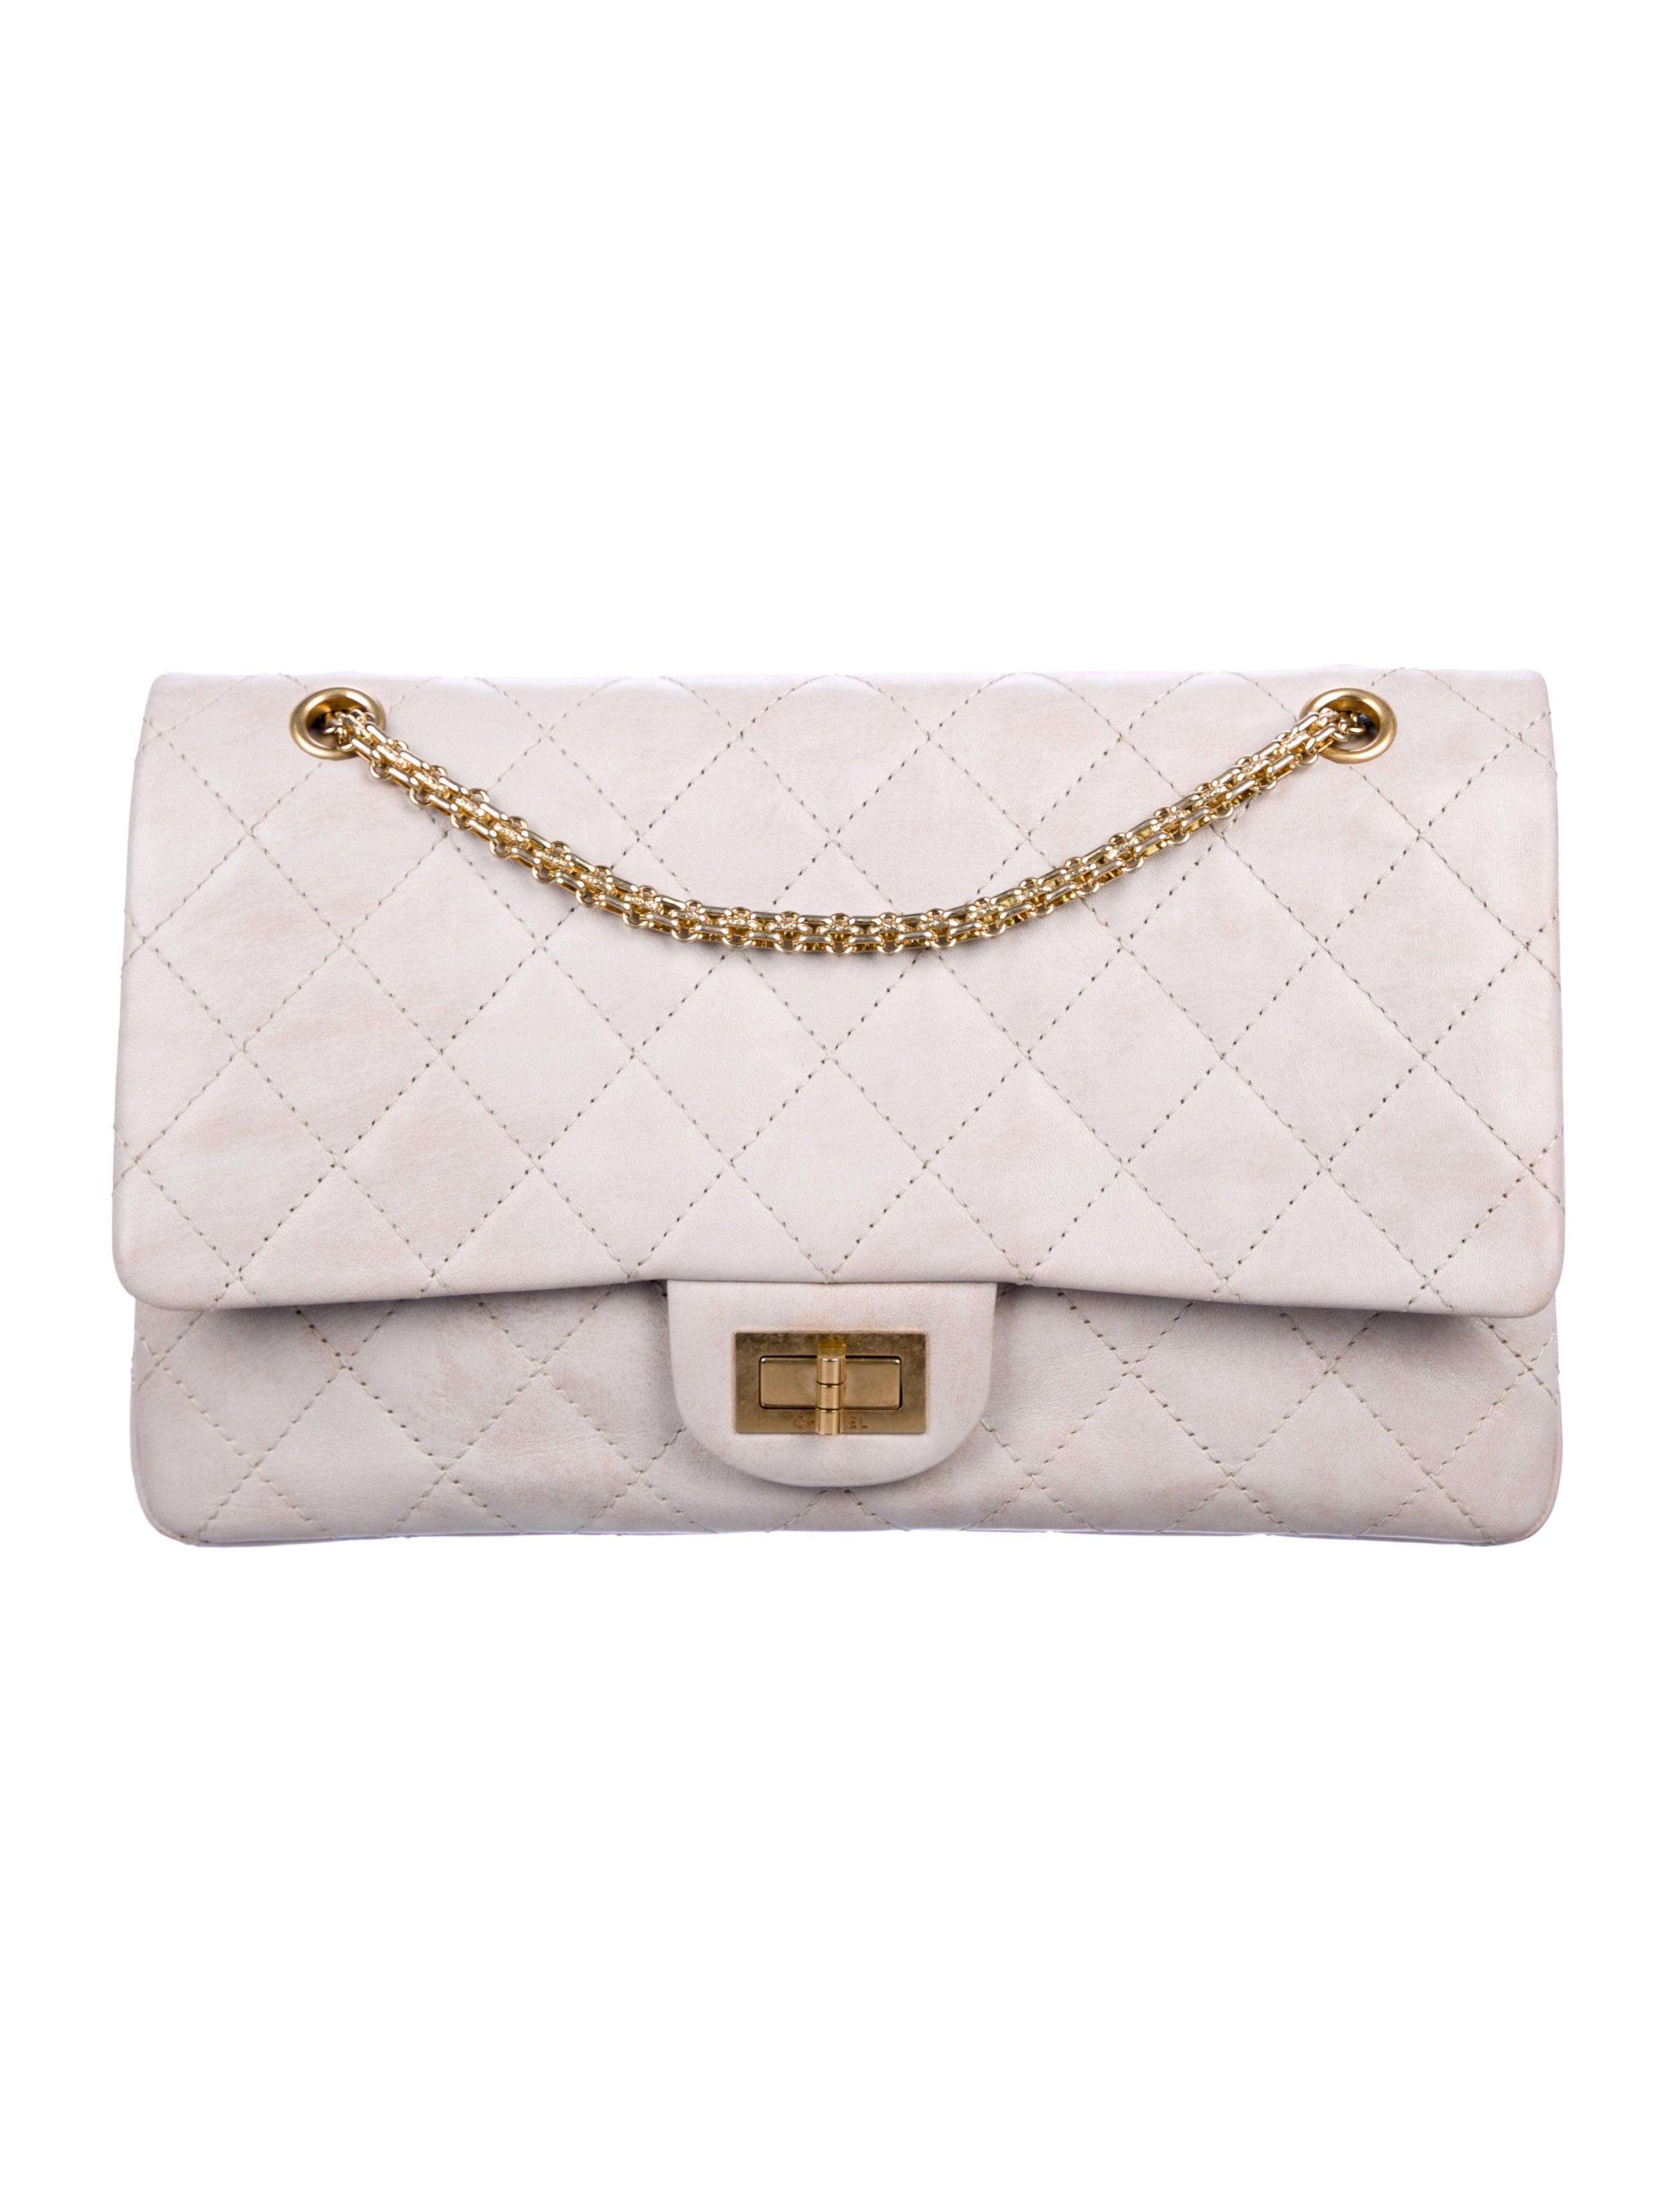 8e1a3d7dda Chanel Handbags | The RealReal